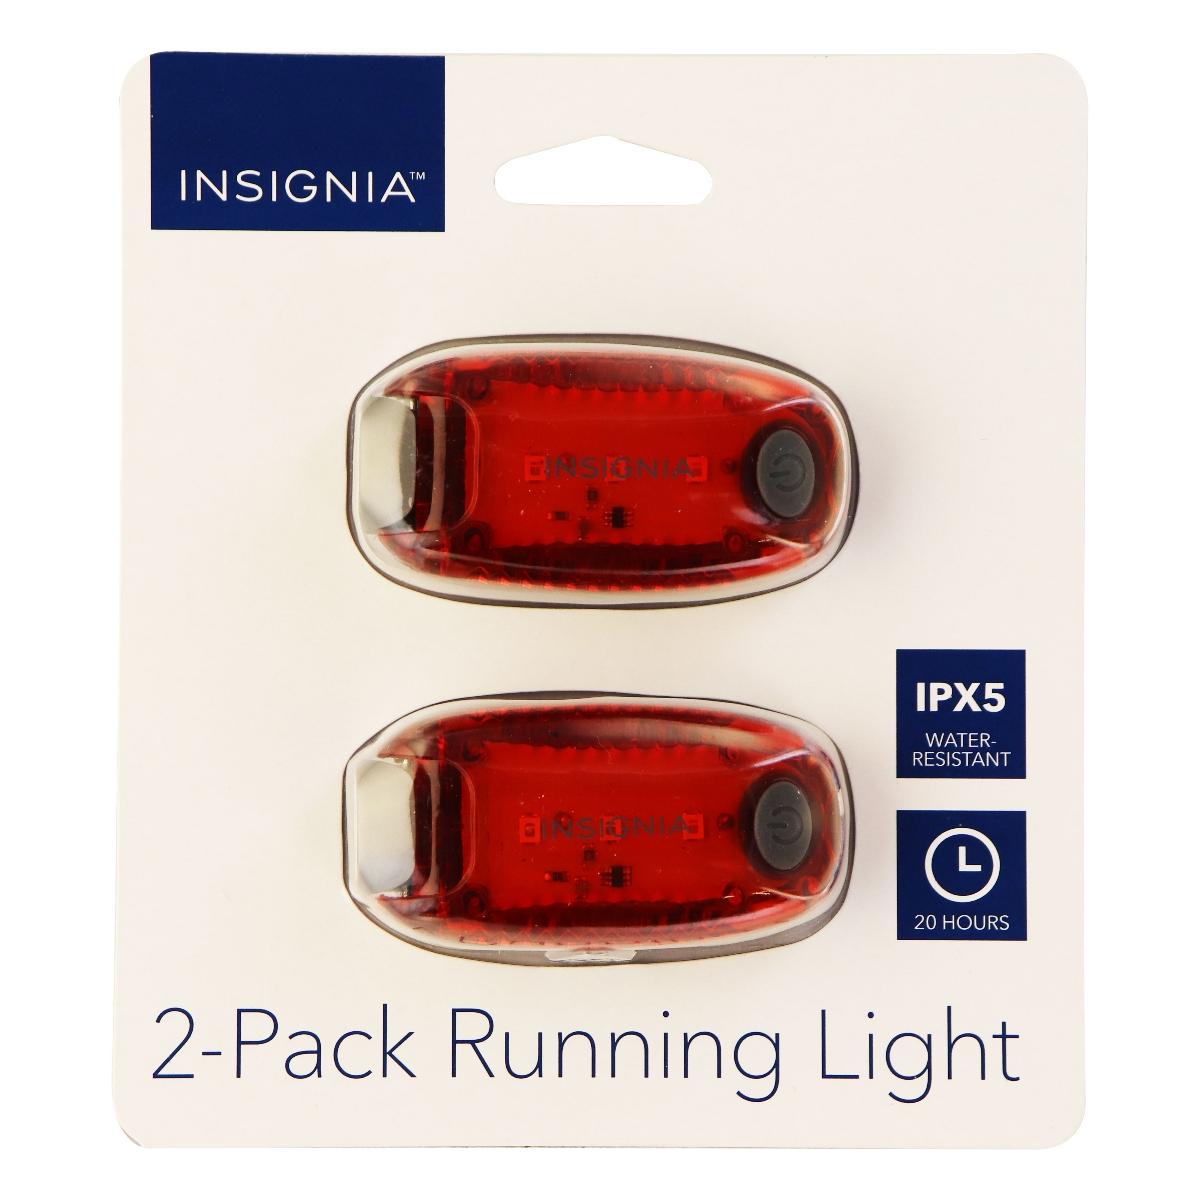 Insignia 2 Pack of LED Running Lights for Running/Walking/Biking - Red